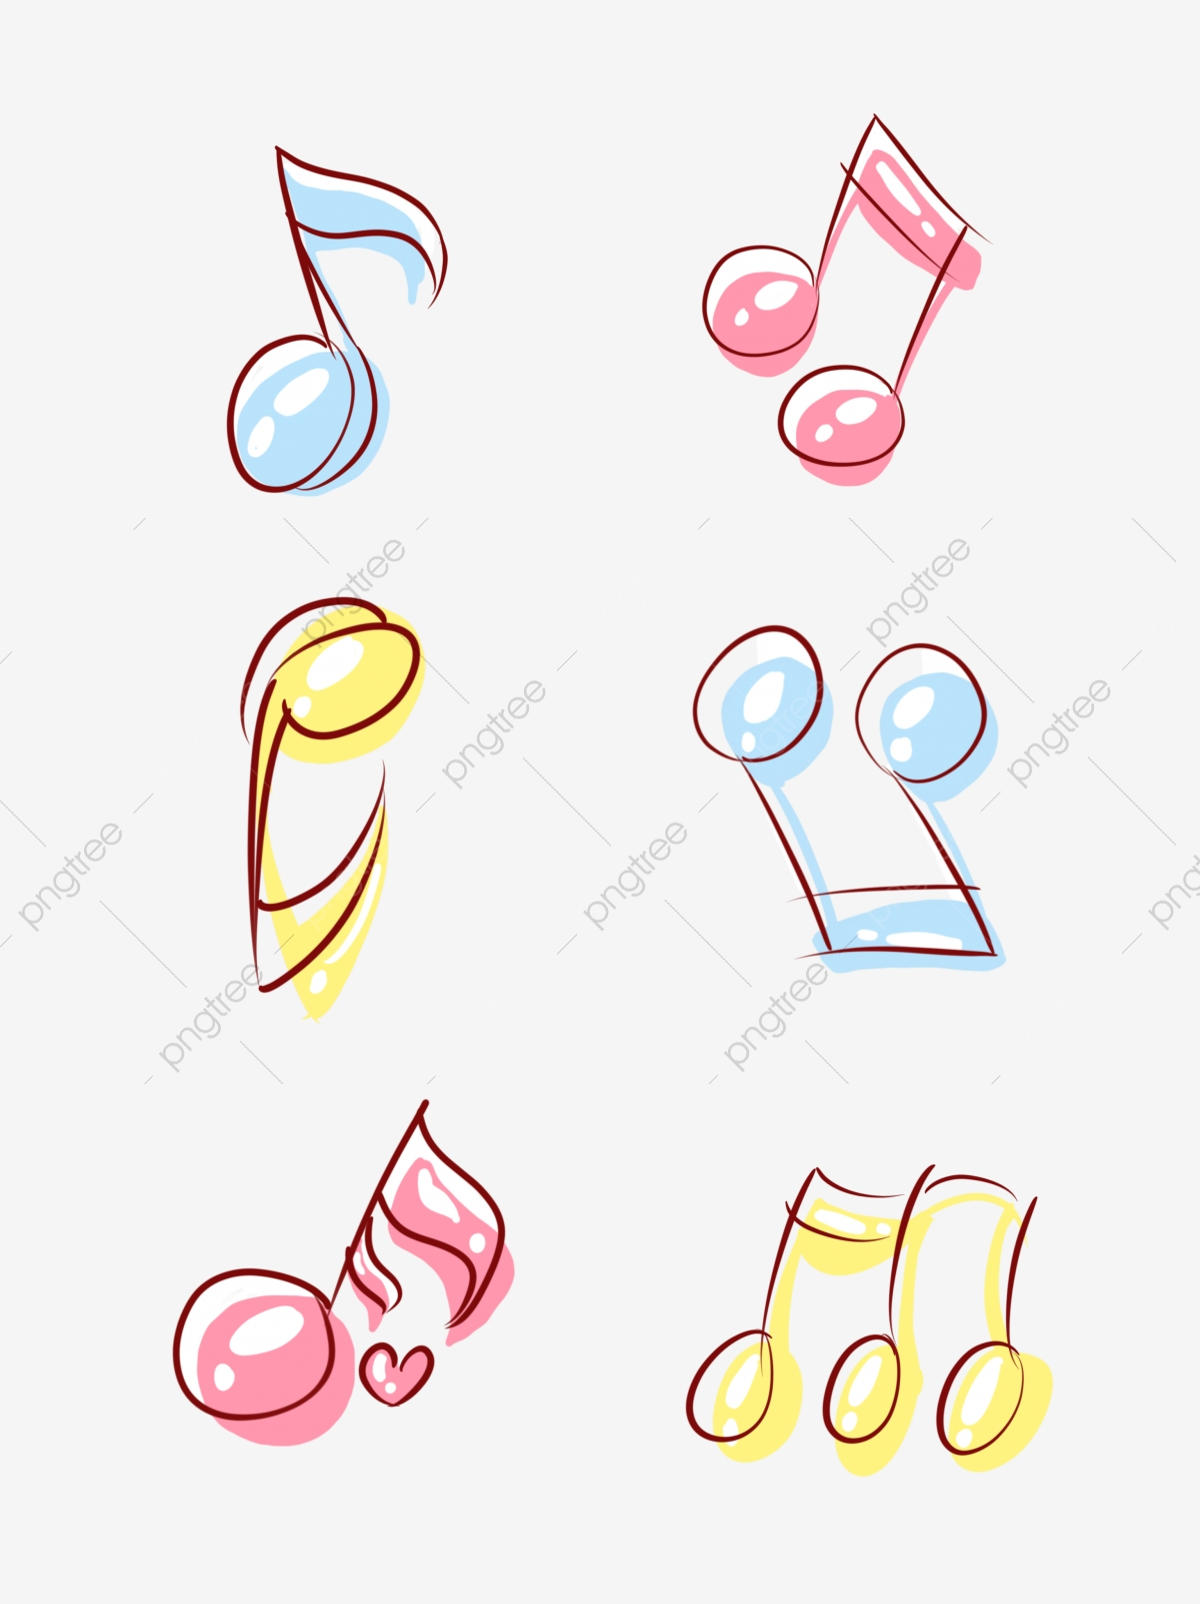 Musique Festival Note Element Dessine A La Main Dessin Anime Stick